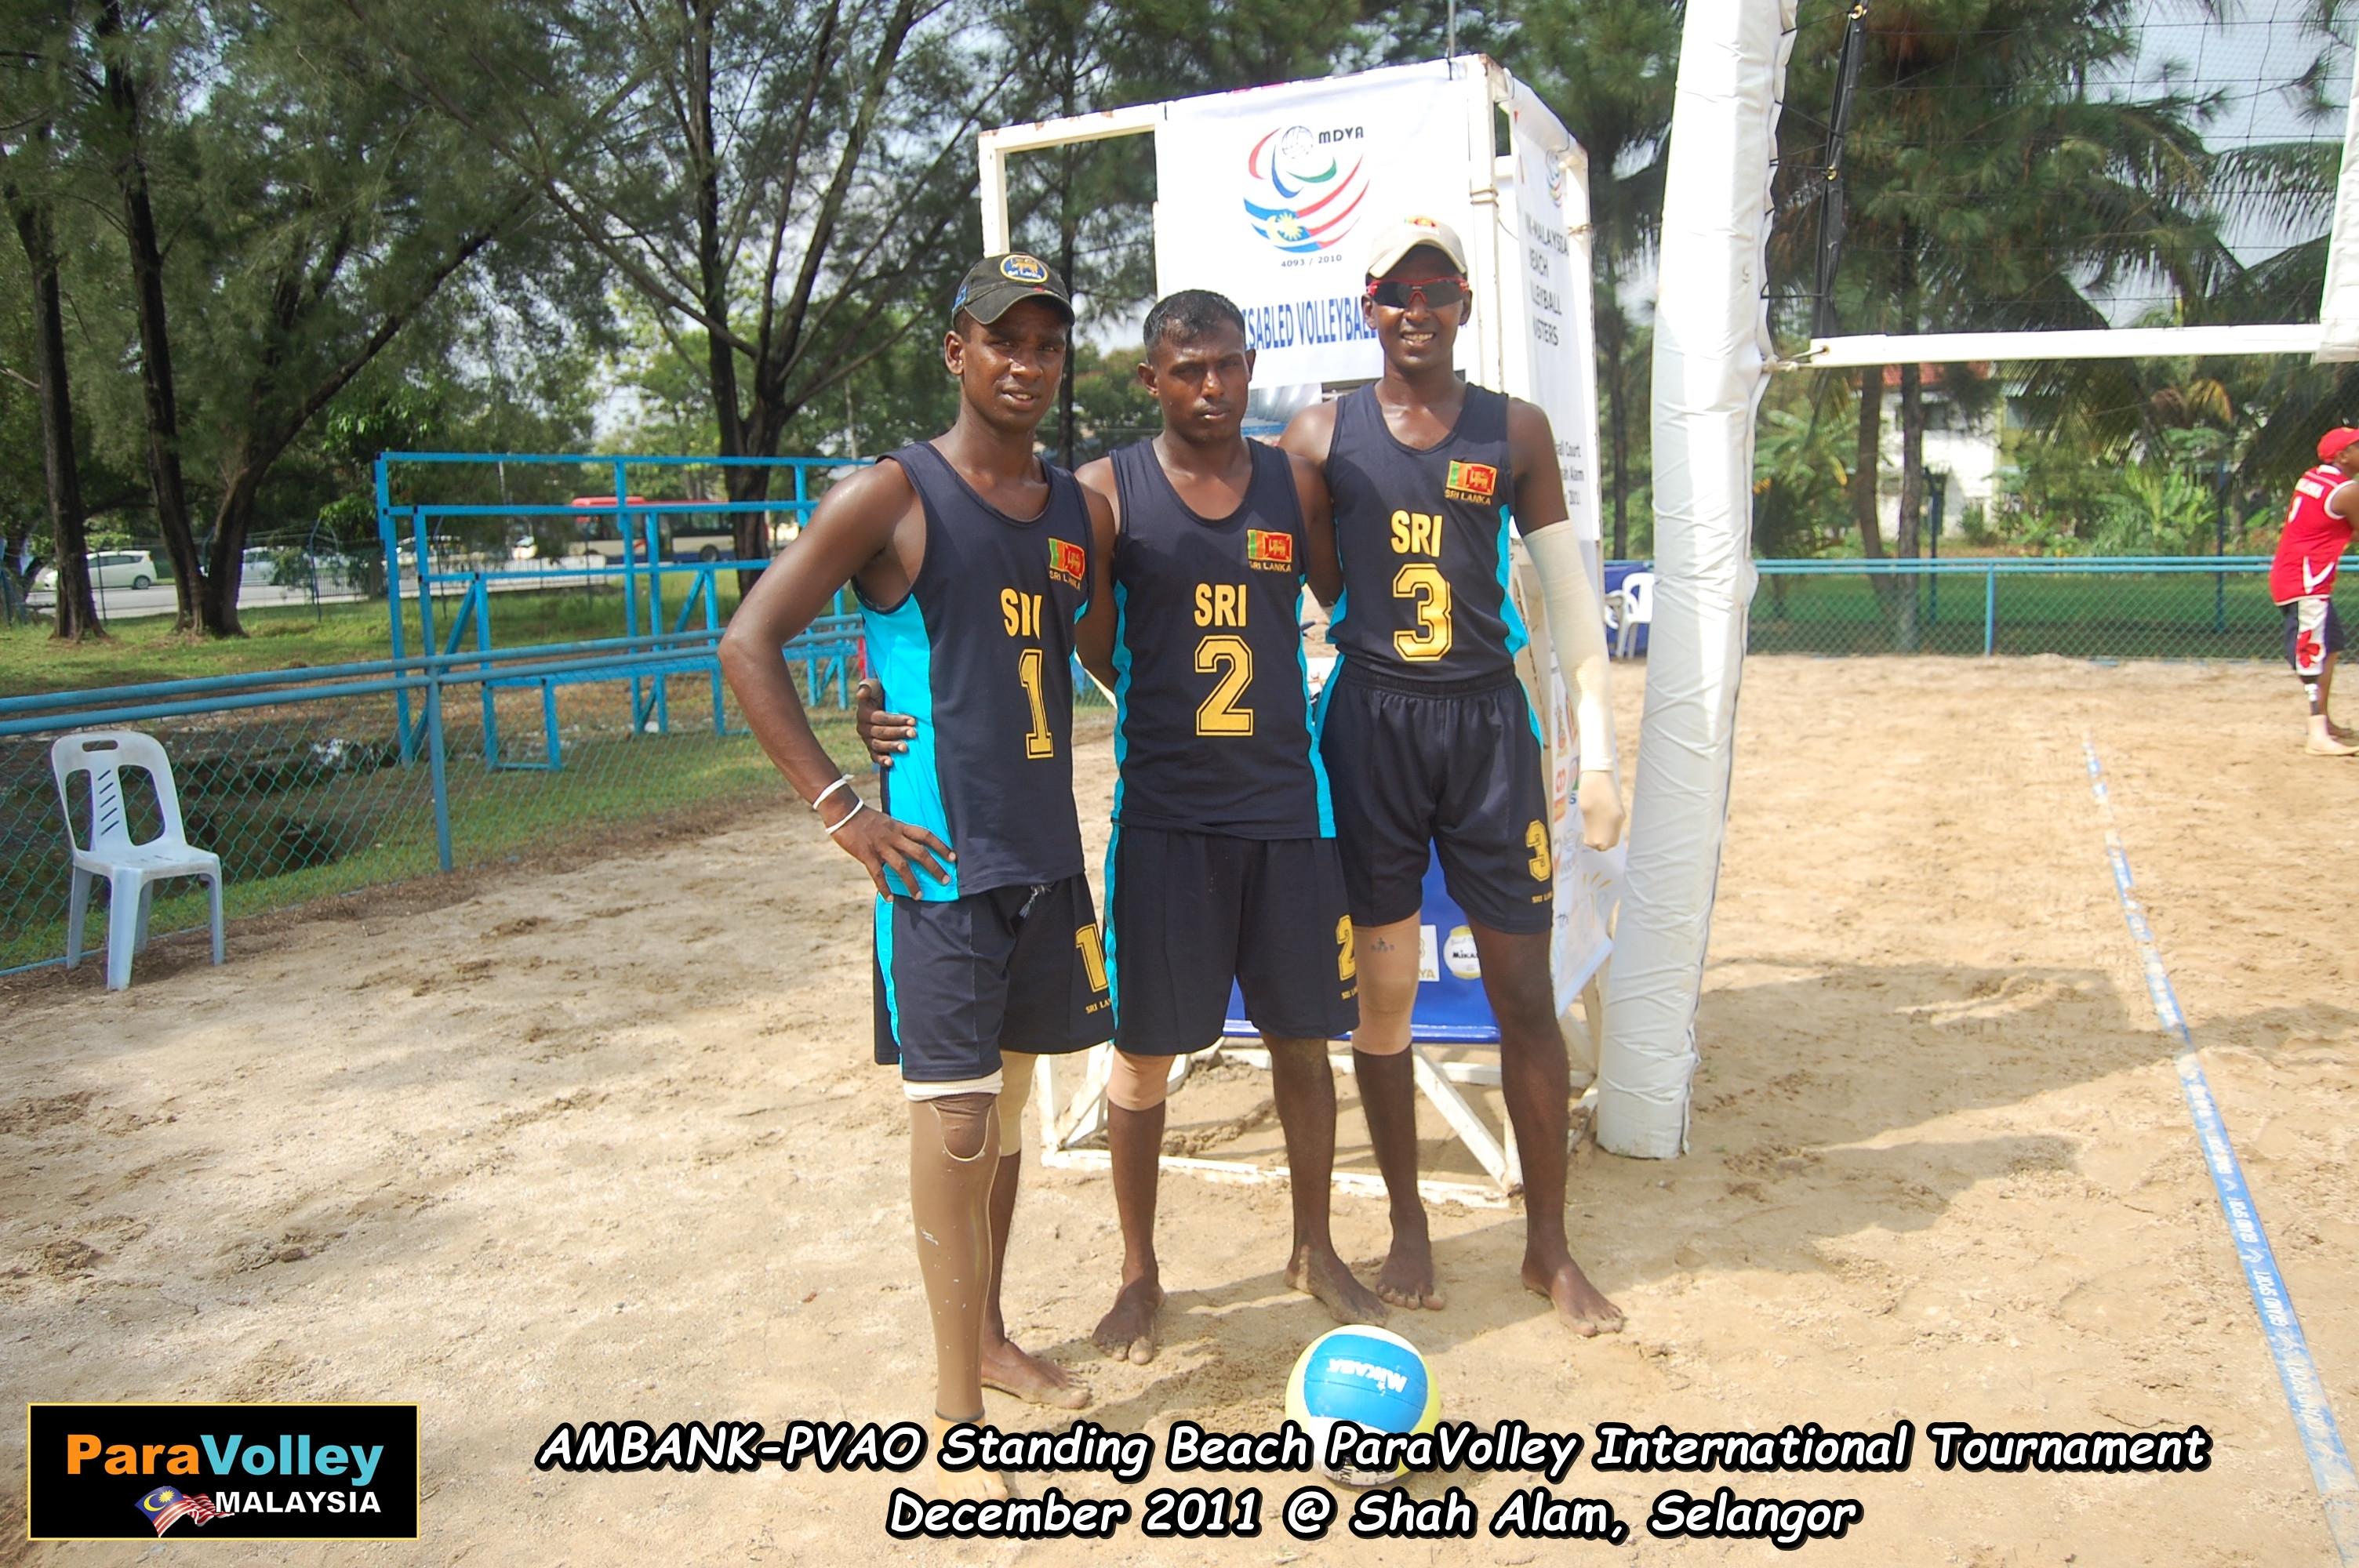 Team SRI 2